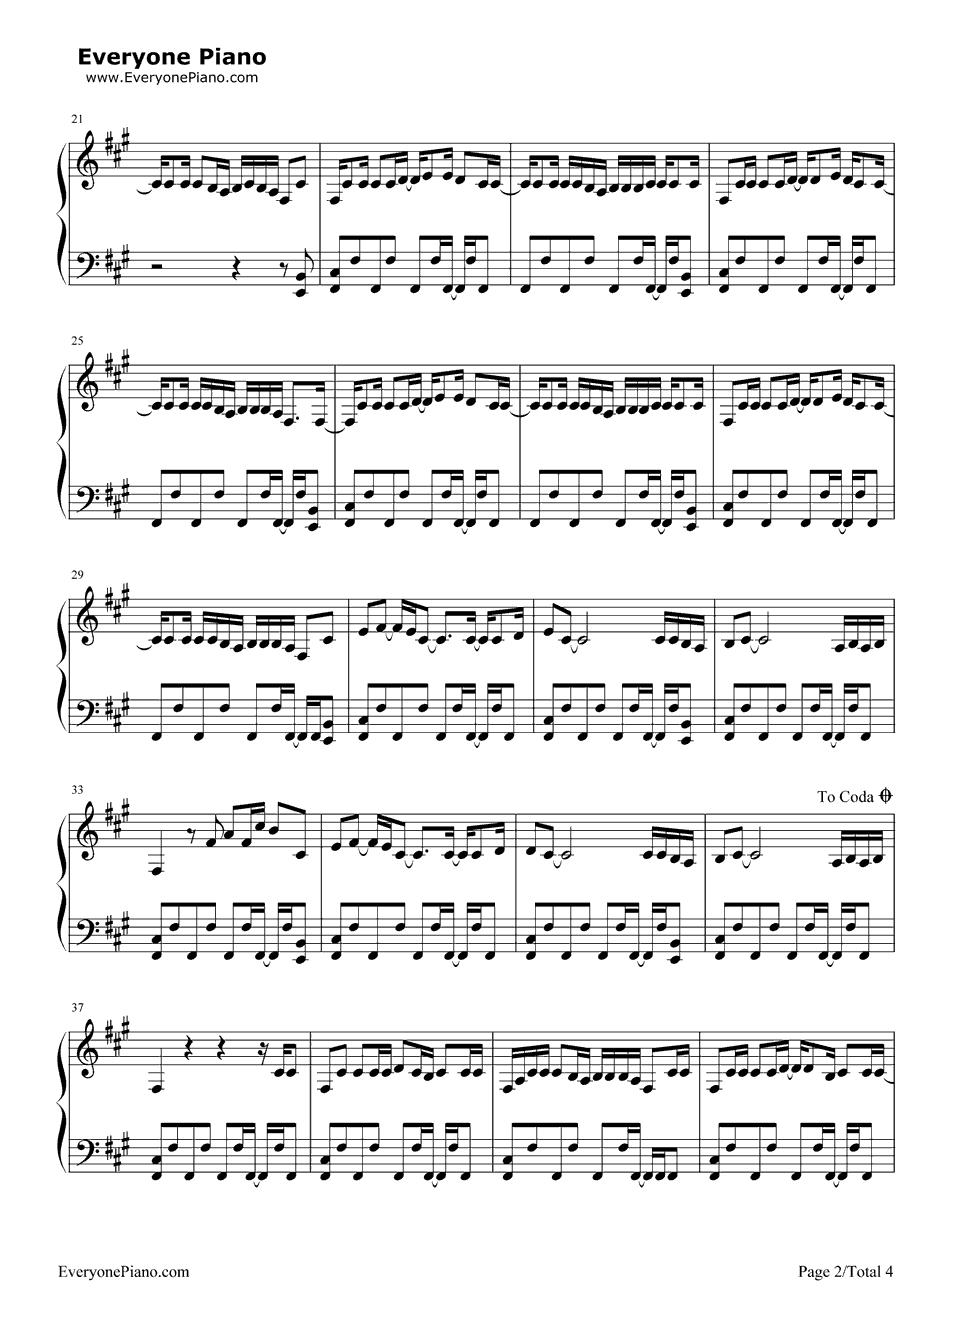 Pon de replay rihanna stave preview 2 free piano sheet music listen now print sheet pon de replay rihanna stave preview 2 hexwebz Image collections